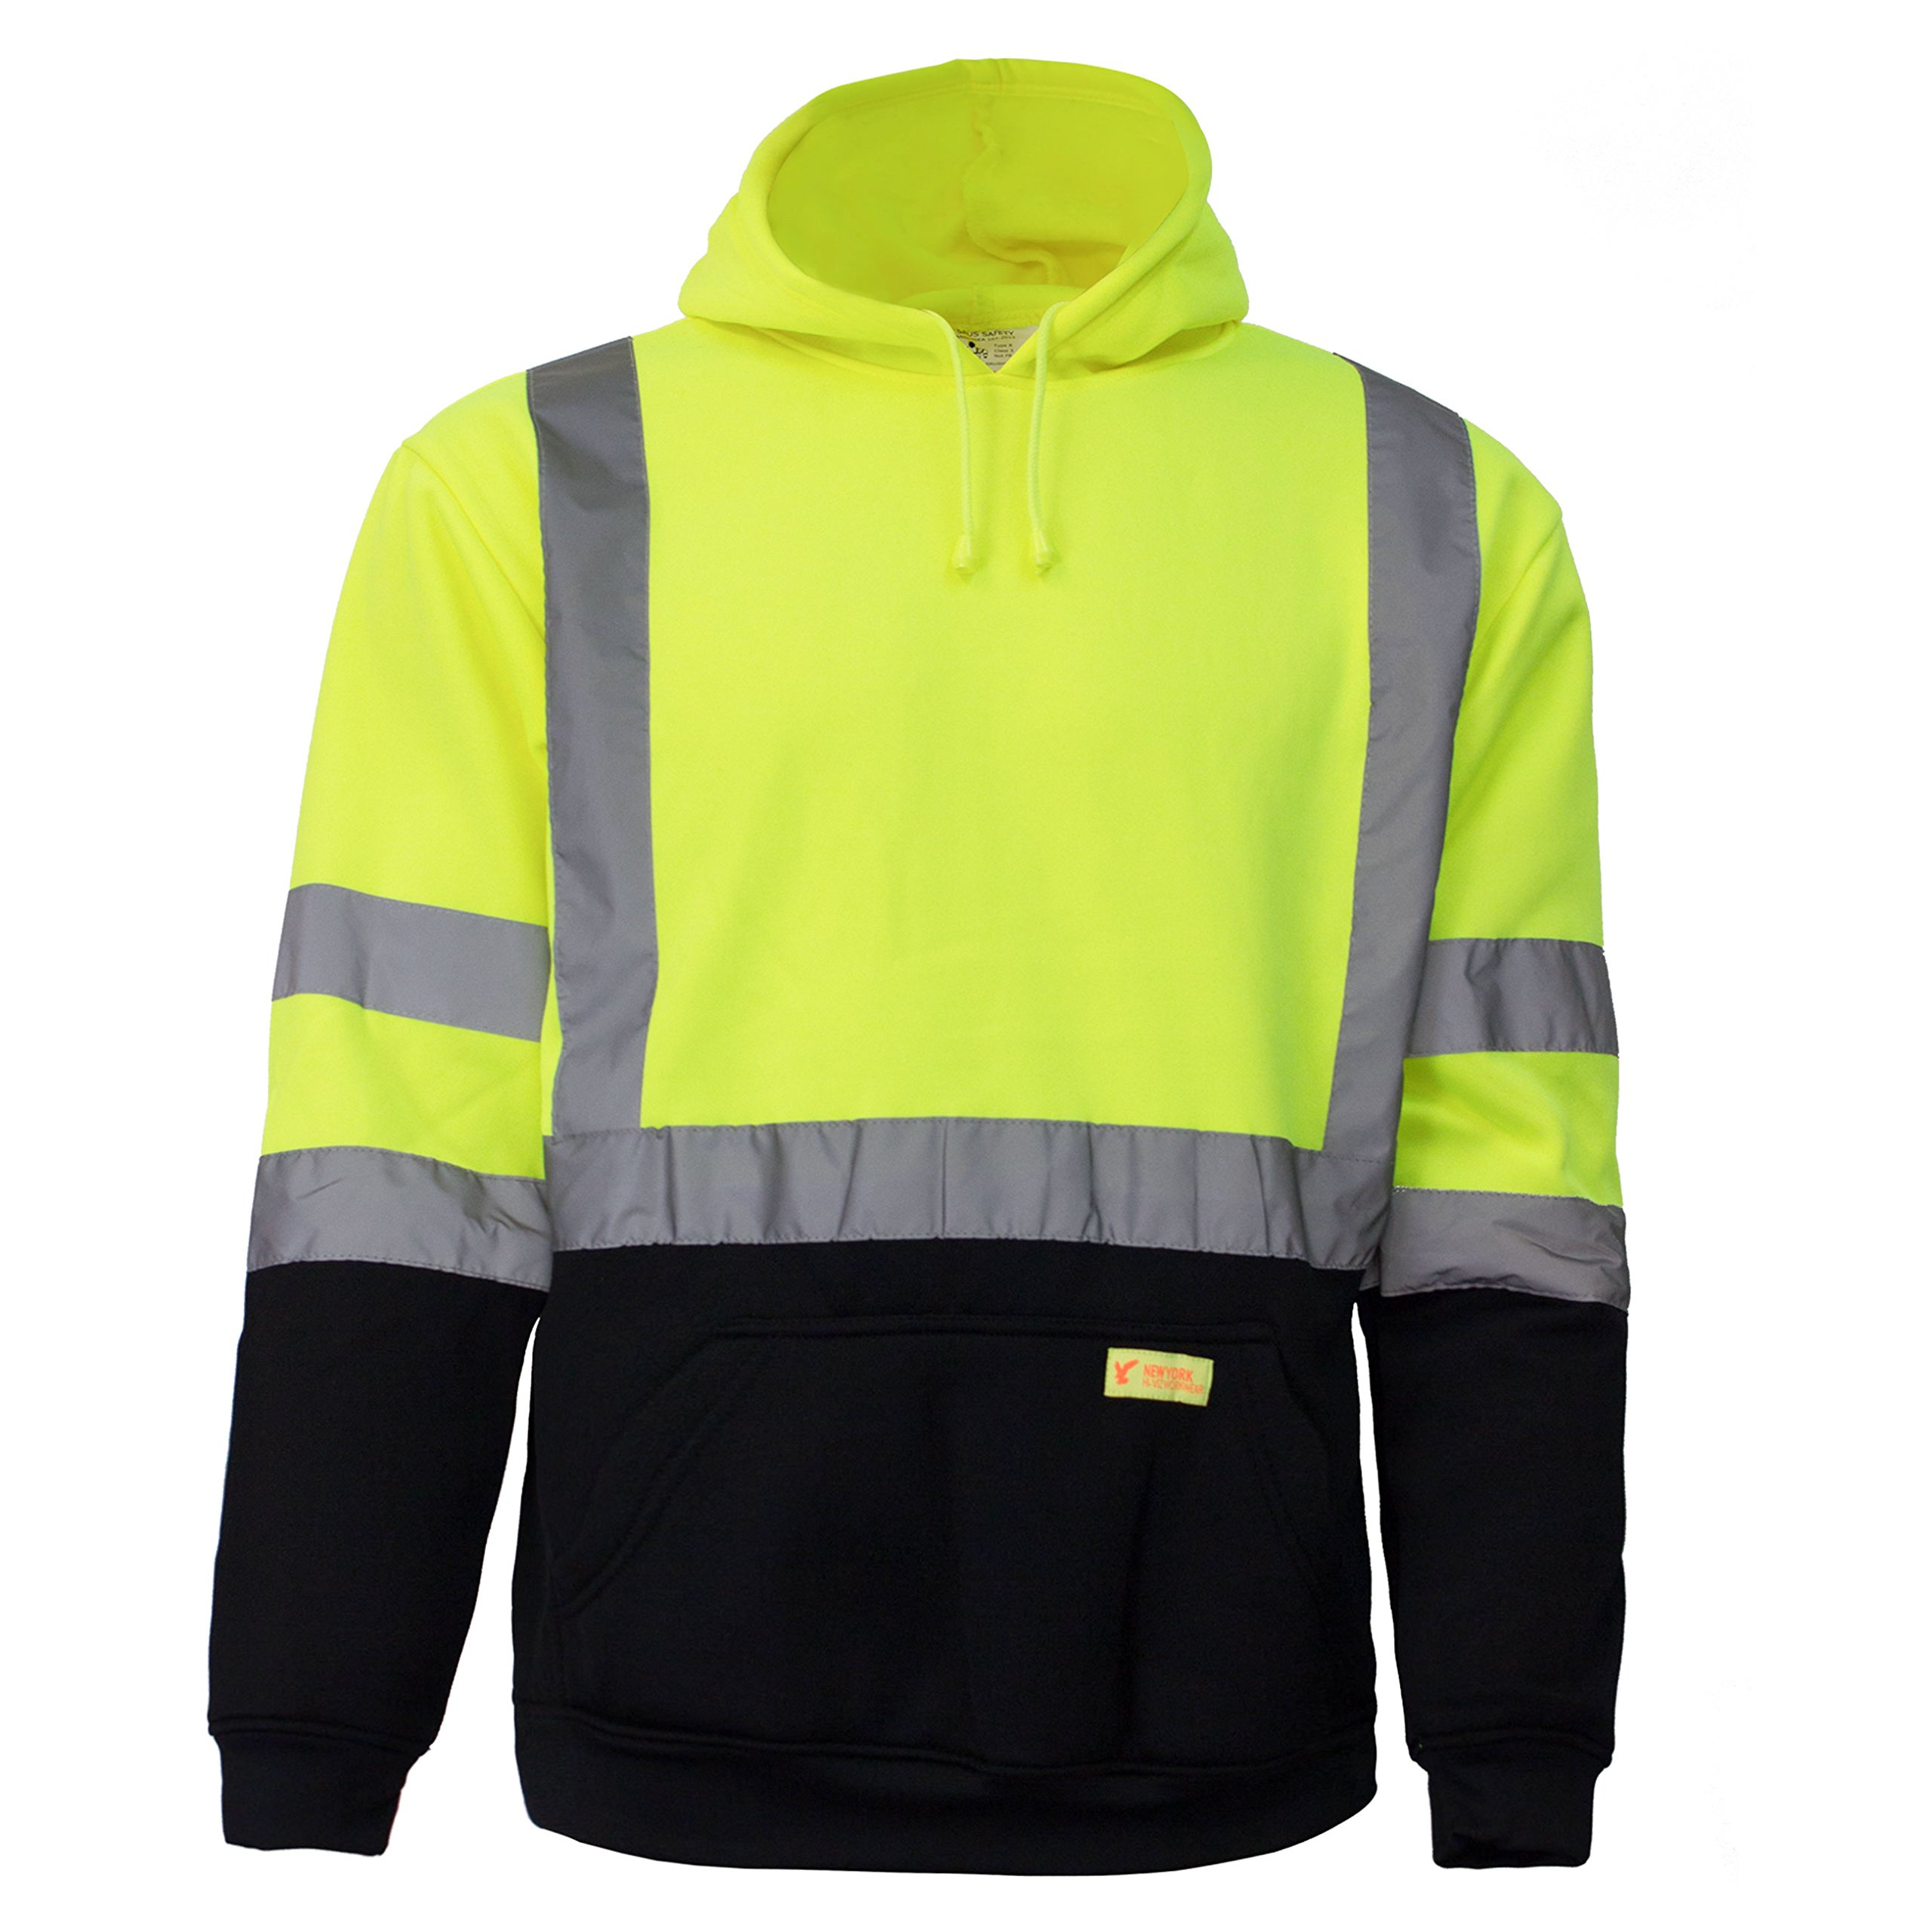 New York Hi-Viz Workwear H8312 Men's ANSI Class 3 High Visibility Class 3 Sweatshirt, Hooded Pullover, Knit Lining, Black Bottom (Lime, Large) by New York Hi-Viz Workwear (Image #7)